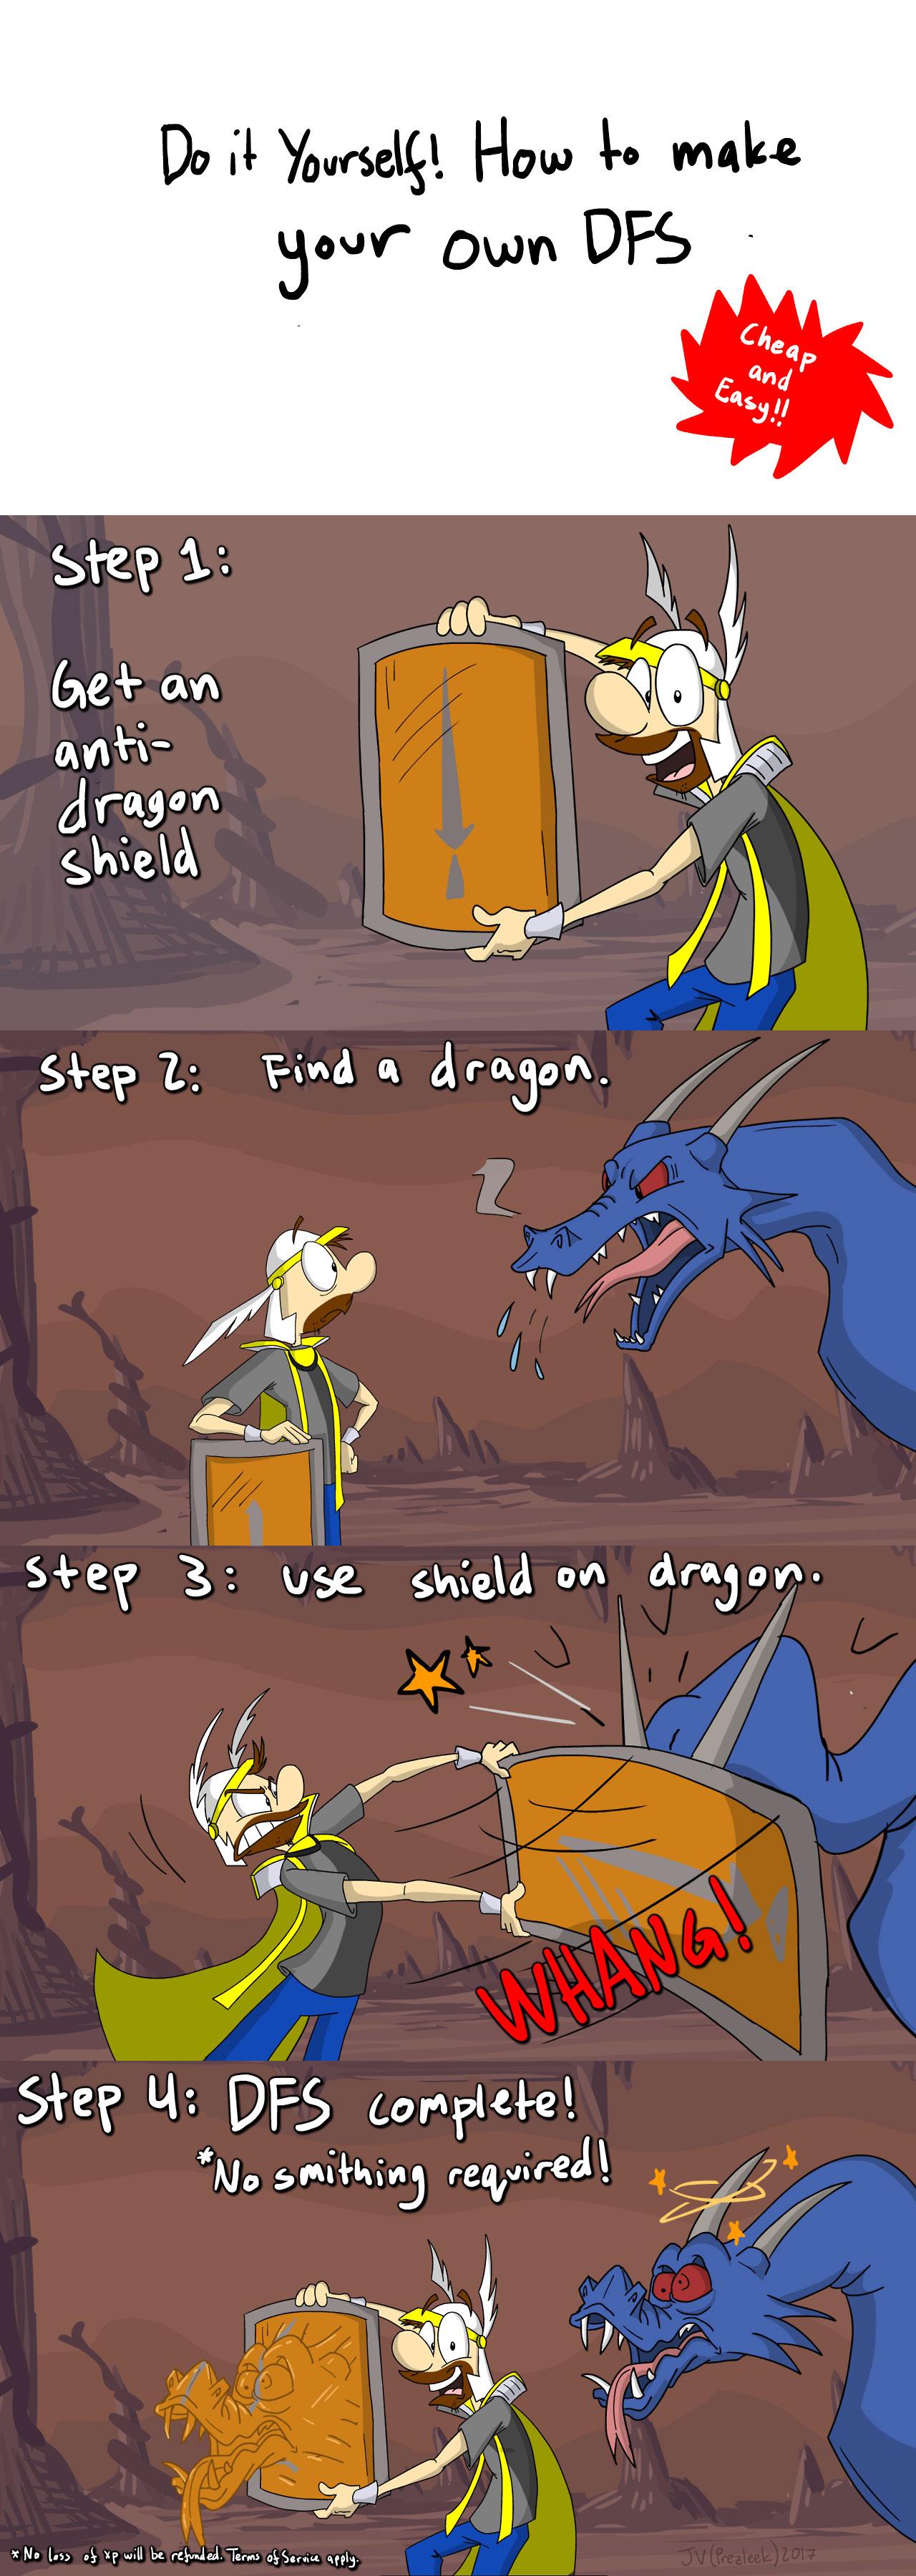 Do it yourself dragonfire shield a video games comic dueling analogs do it yourself dragonfire shield solutioingenieria Gallery